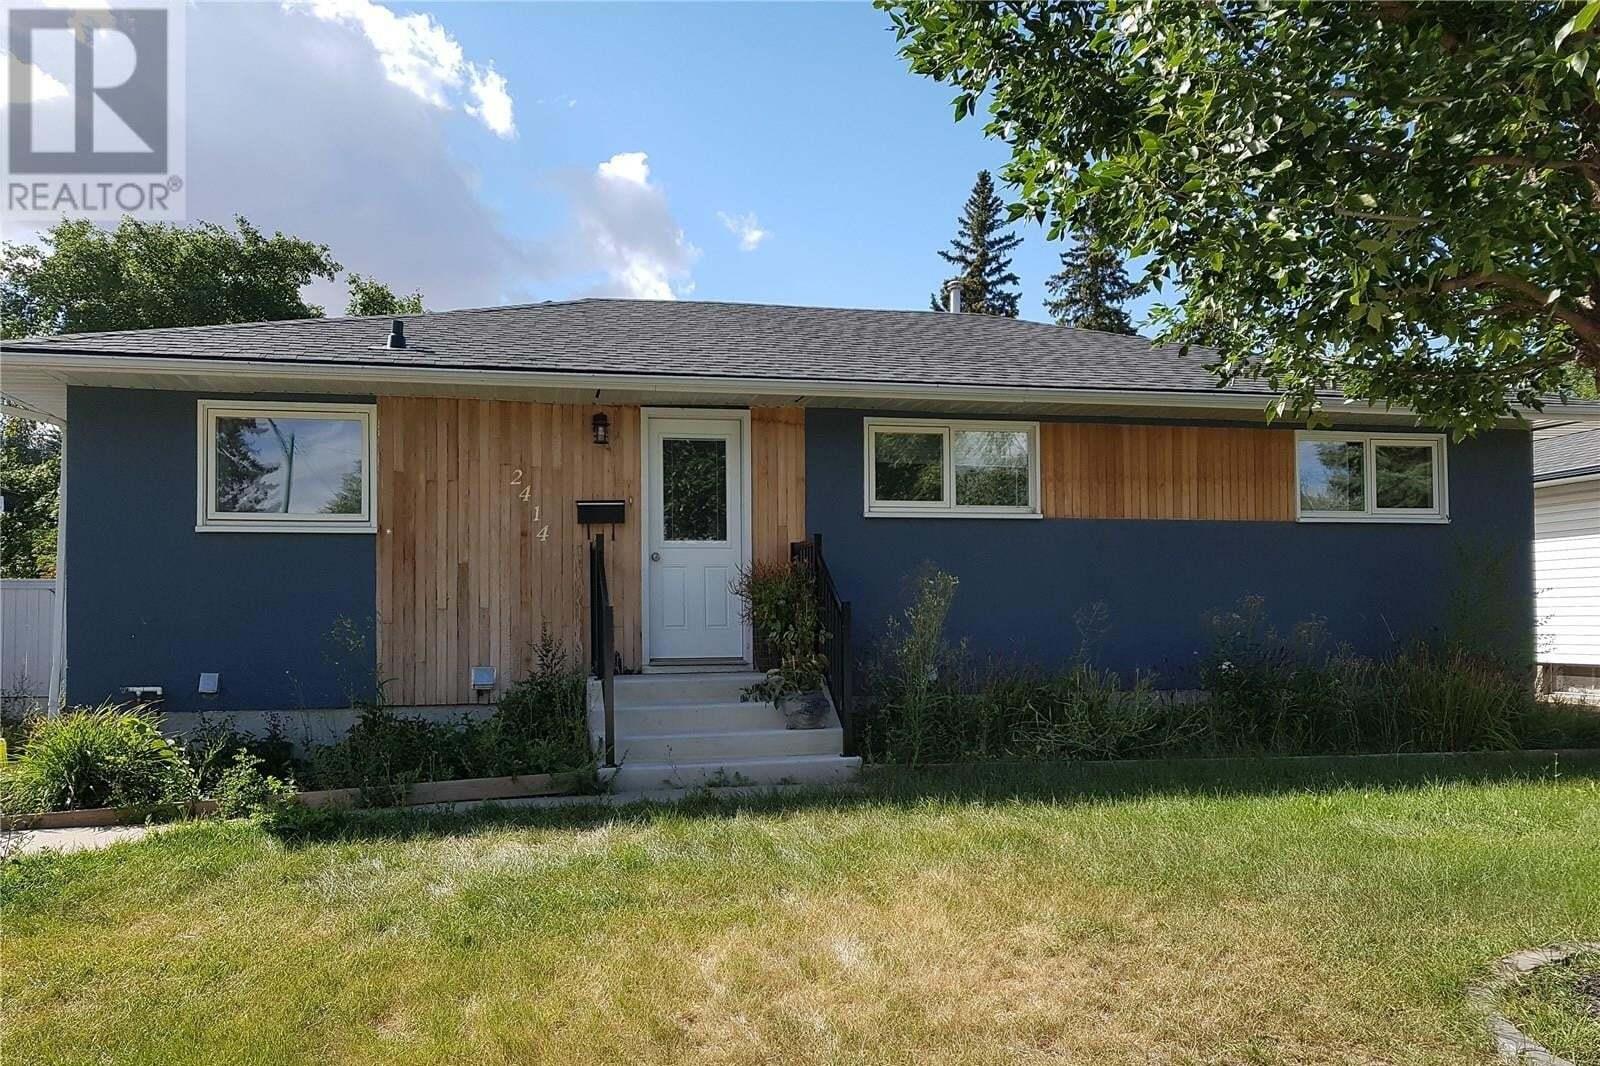 House for sale at 2414 Albert Ave Saskatoon Saskatchewan - MLS: SK825846